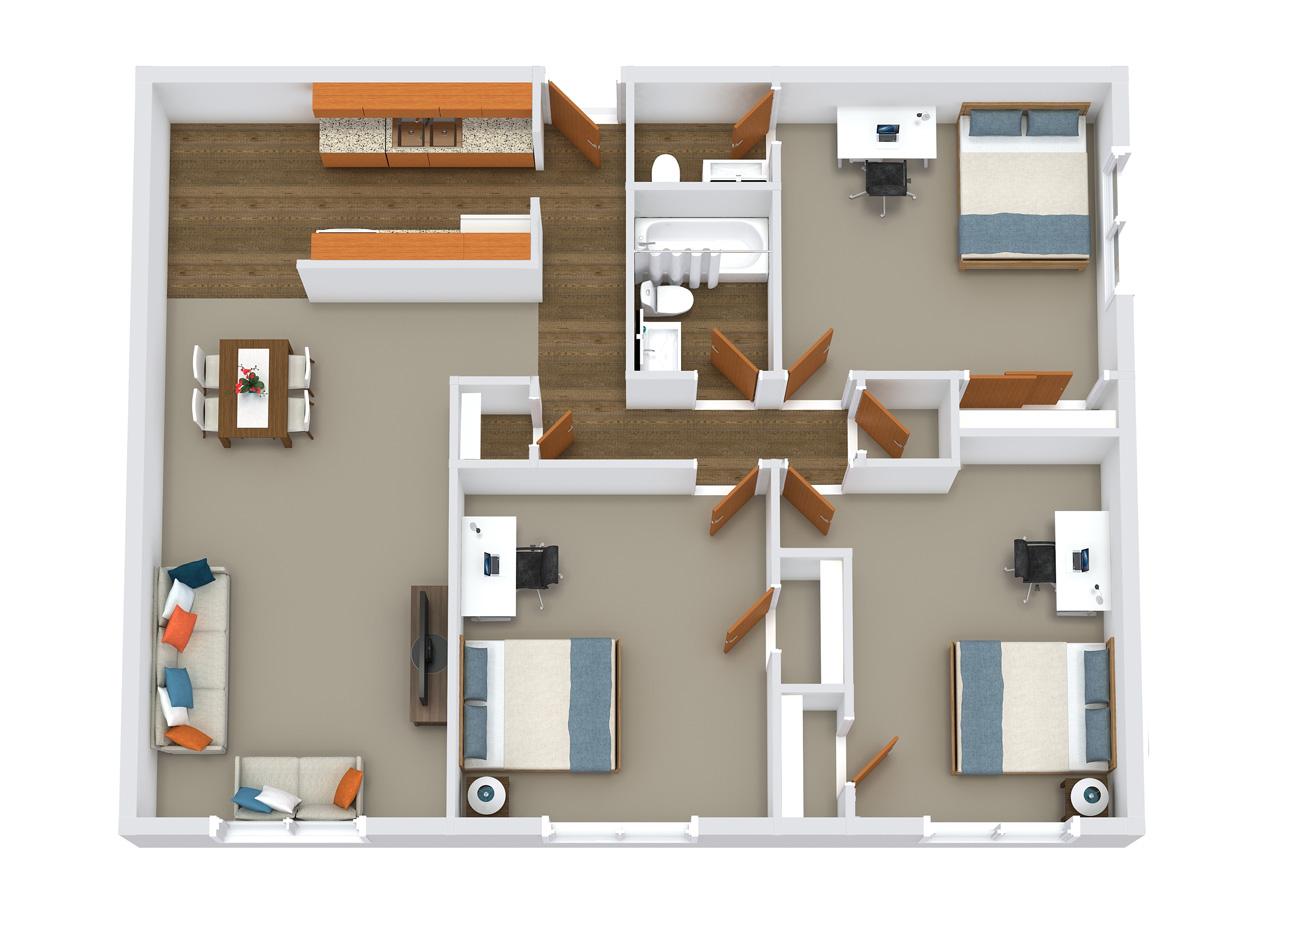 element apartments floor plans 3x1.5